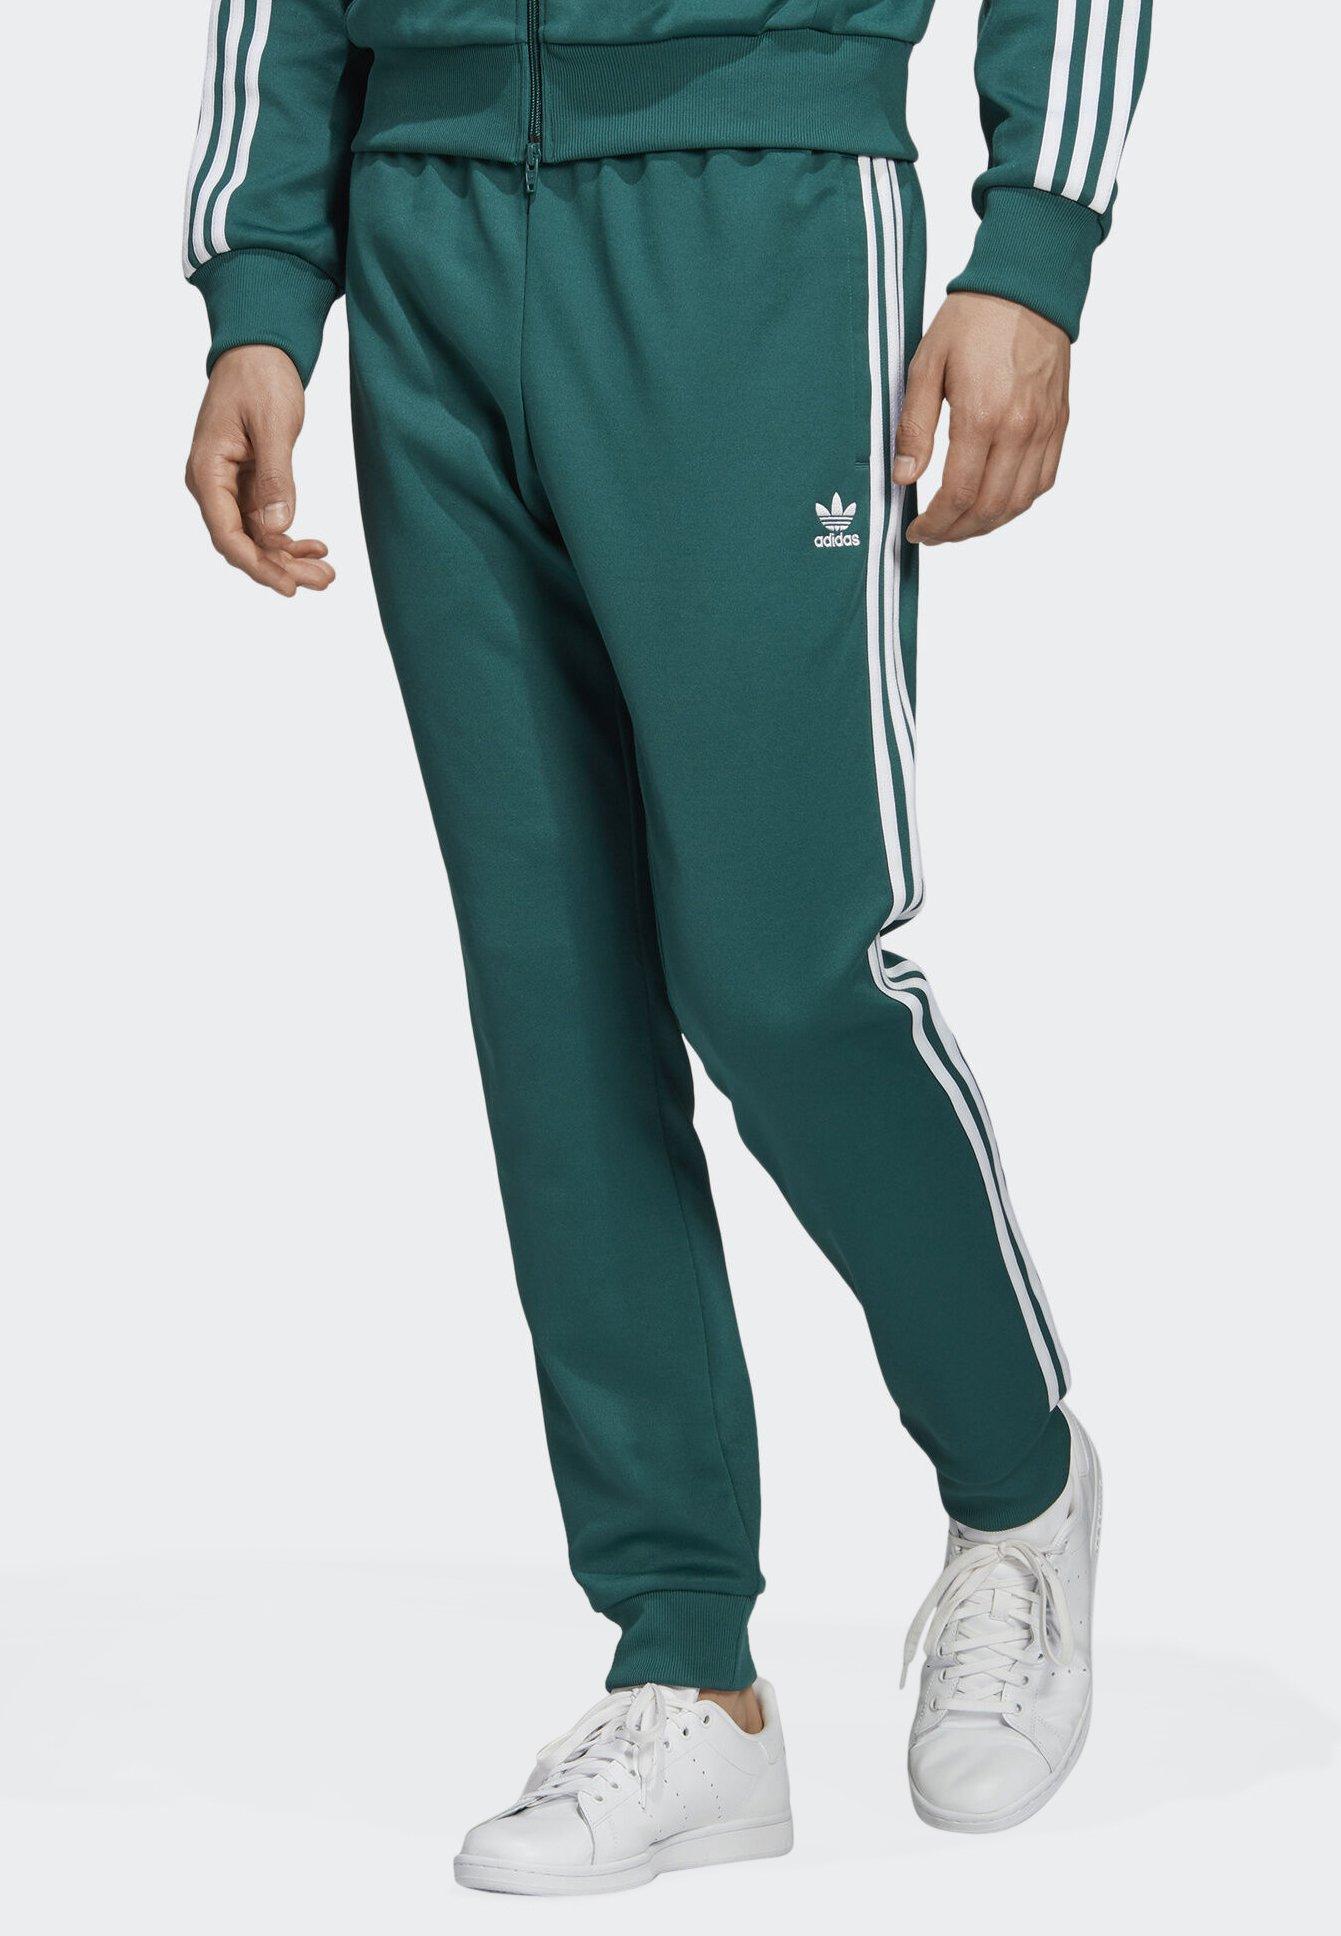 Calor Tipo delantero Sanción  adidas Originals SST TRACKSUIT BOTTOMS - Pantalon de survêtement - green -  ZALANDO.FR